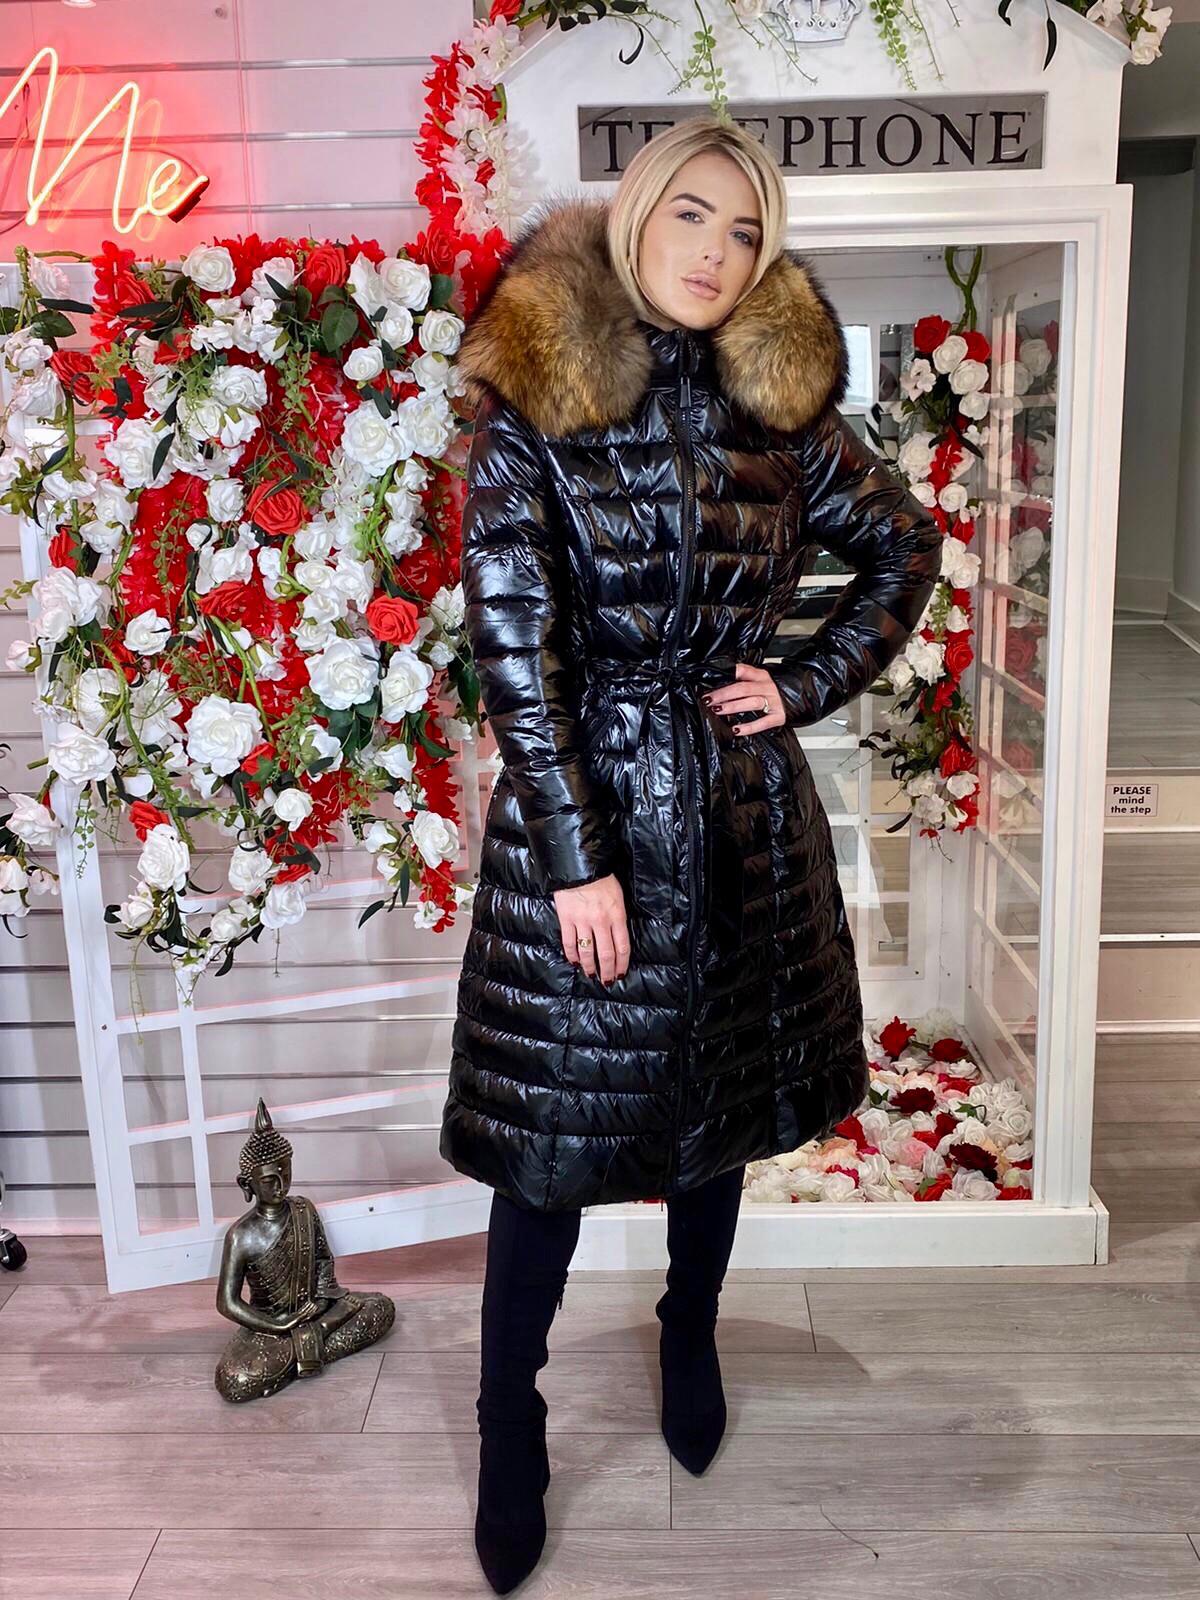 Laura Jane Paris 'Val Thorens' Luxury Xlong Coat in Black with Natural